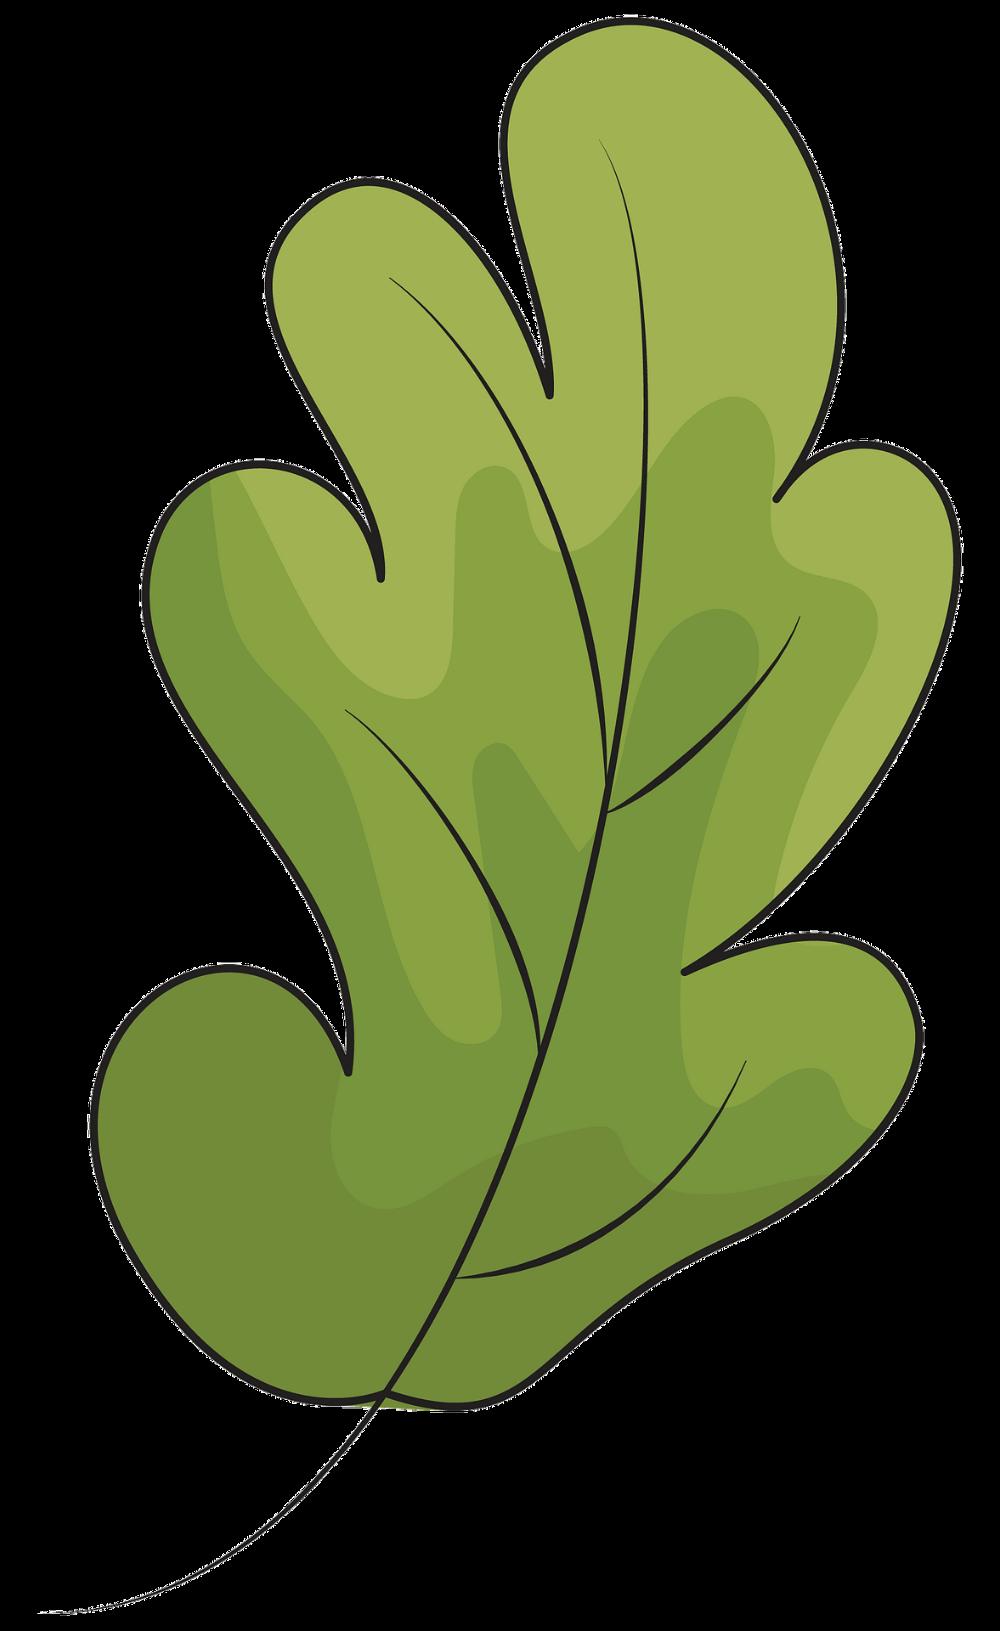 Oak Leaf Clipart Free Download Transparent Png Creazilla Clip Art Leaf Clipart Leaf Template